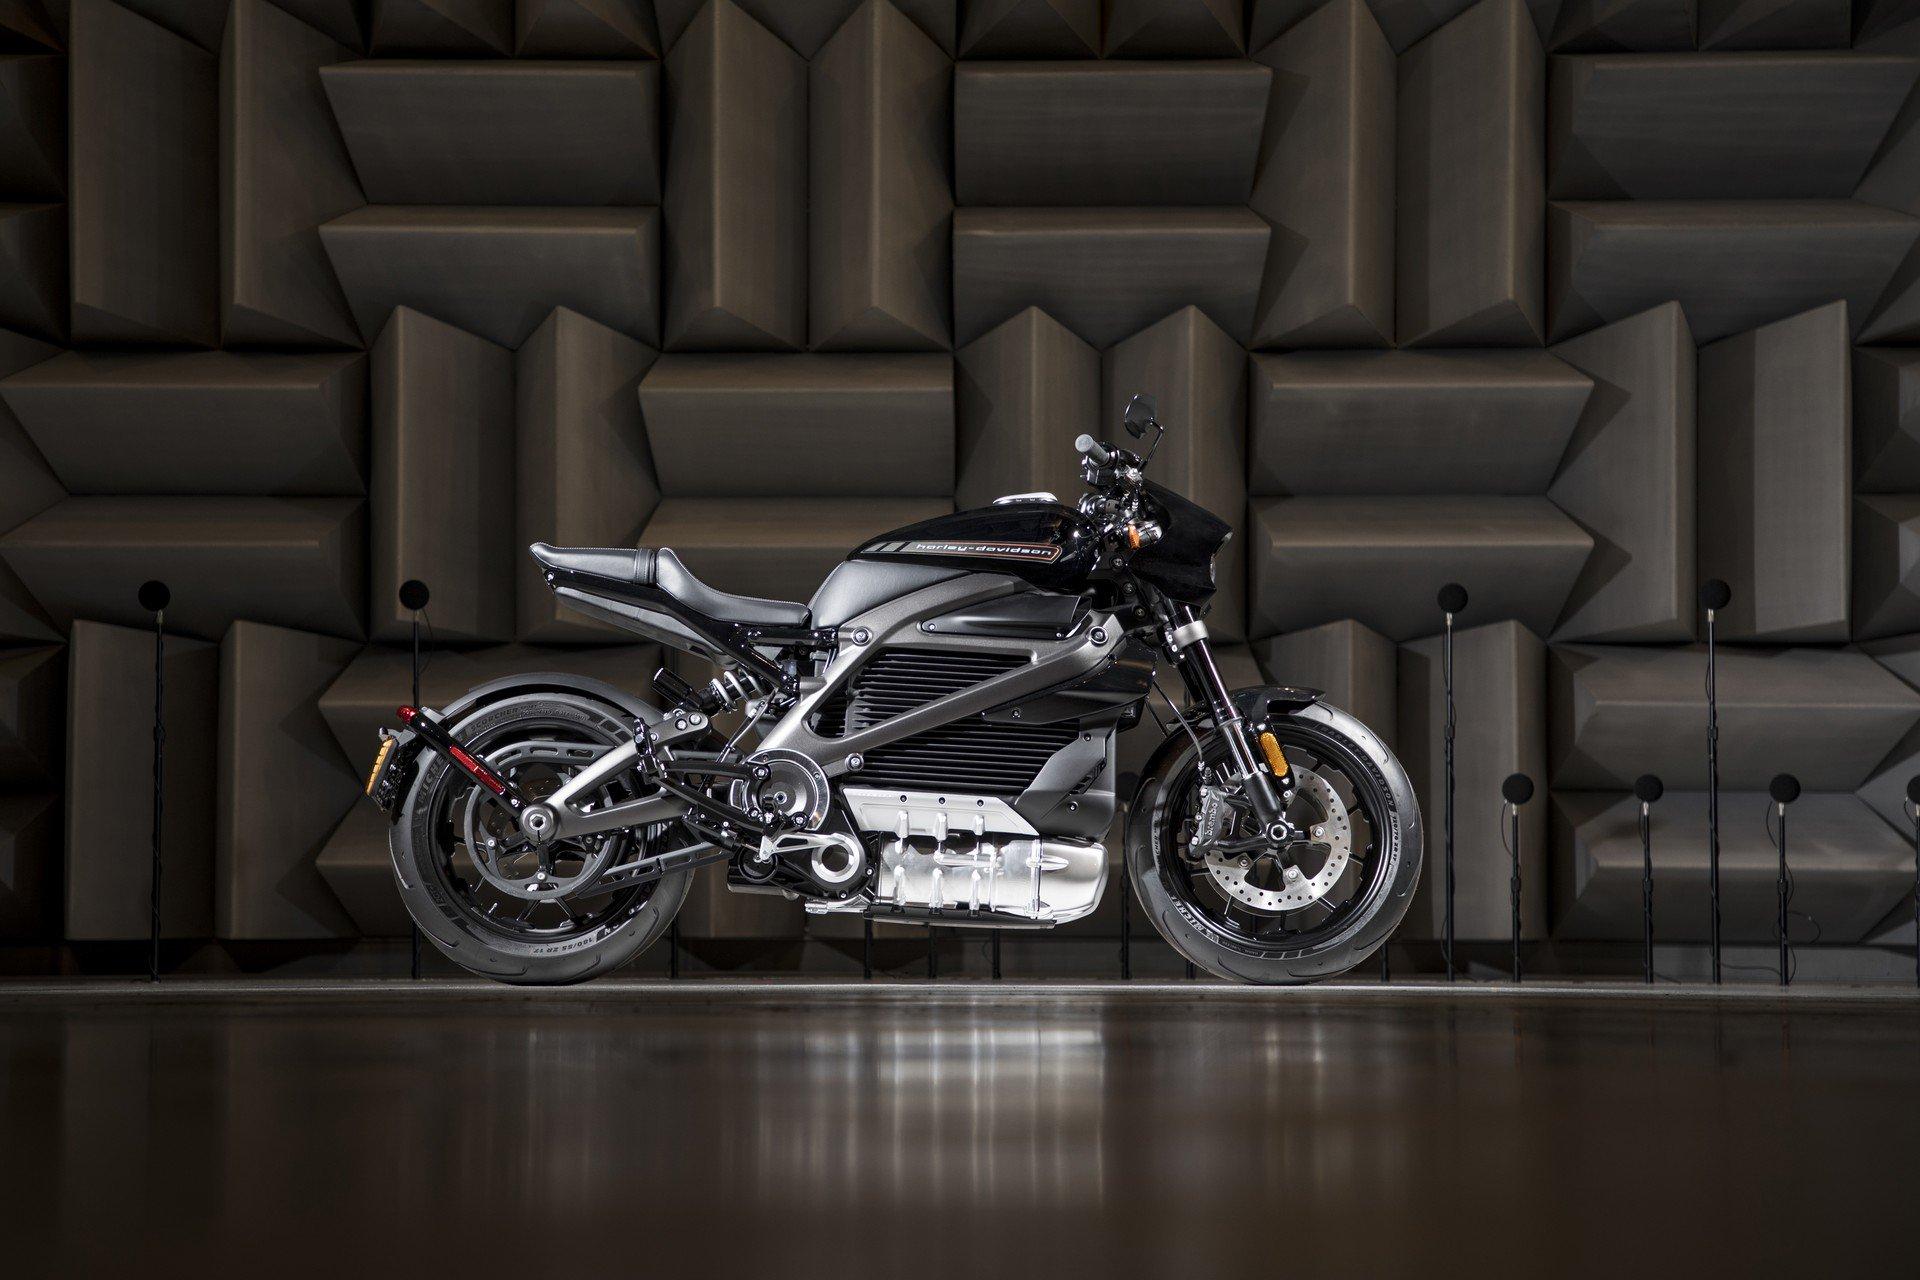 Harley Davidson'un elektrikli motosikleti 30 bin dolara 177 km menzil sunacak